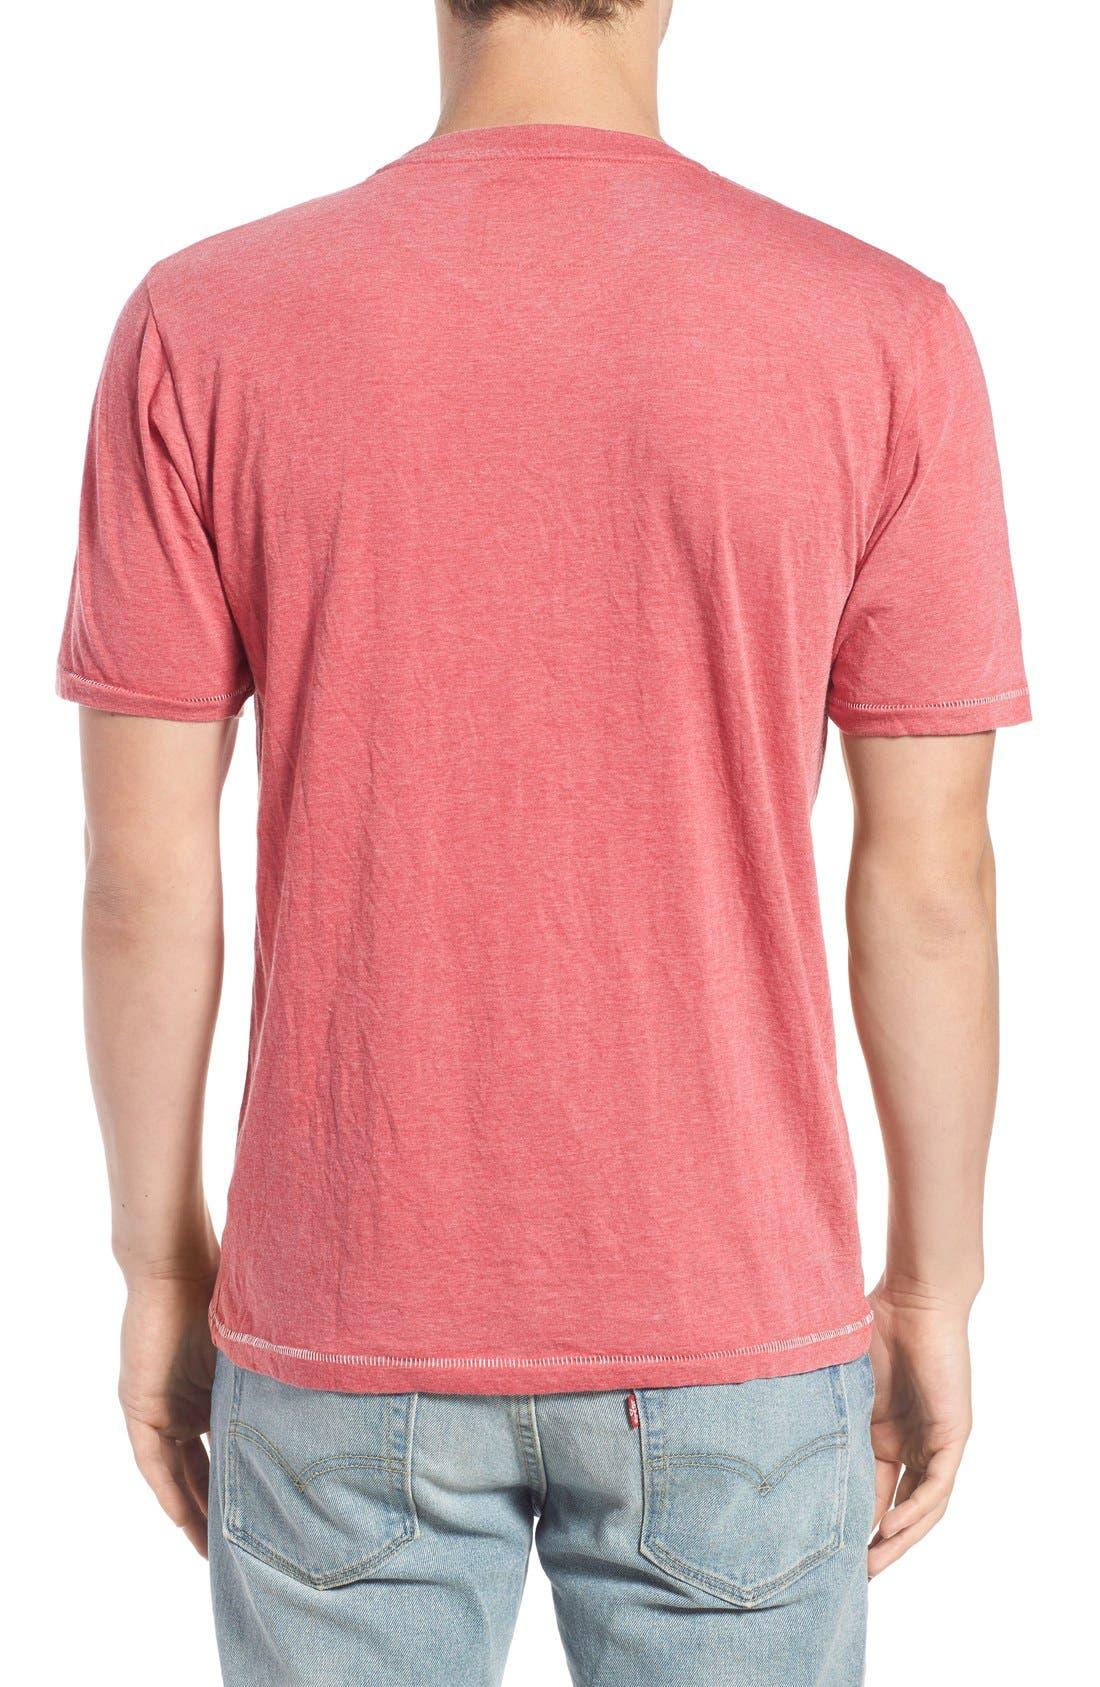 'California Angels' Graphic V-Neck T-Shirt,                             Alternate thumbnail 2, color,